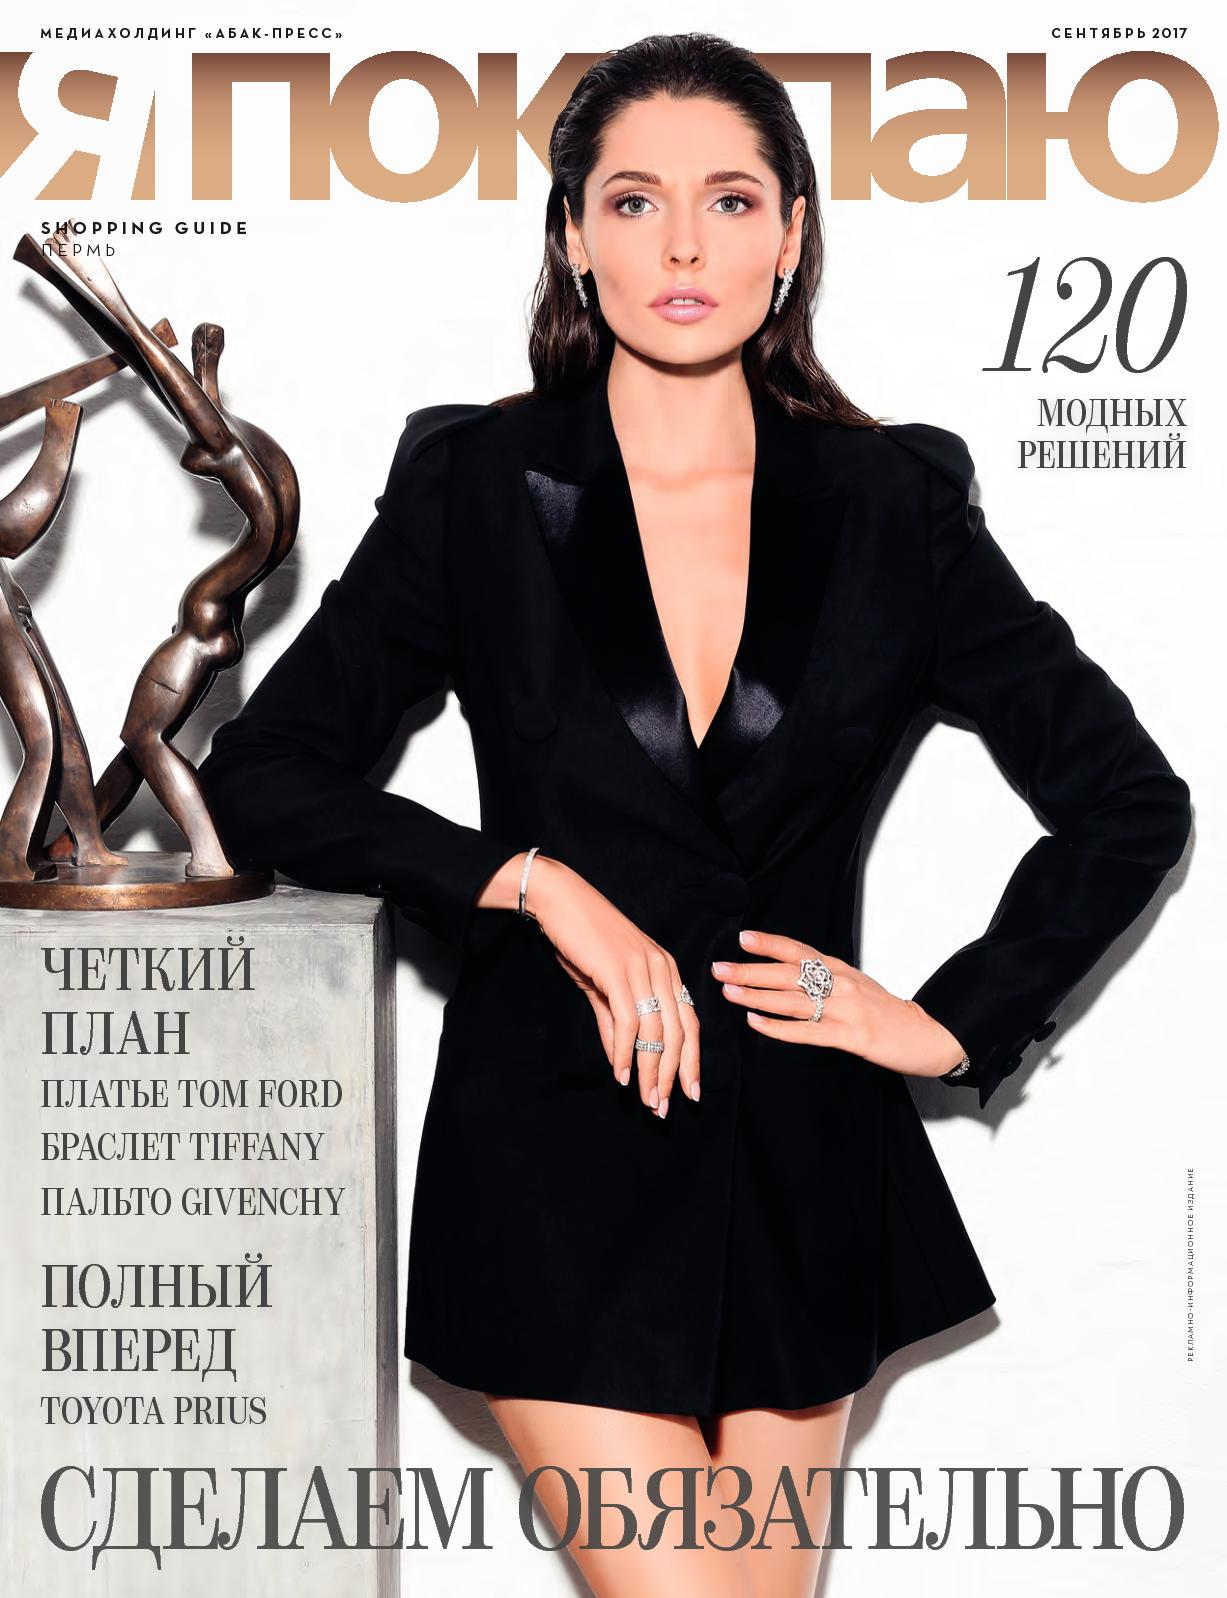 2544cfc1235 Calaméo - Shopping Guide «Я Покупаю. Пермь»